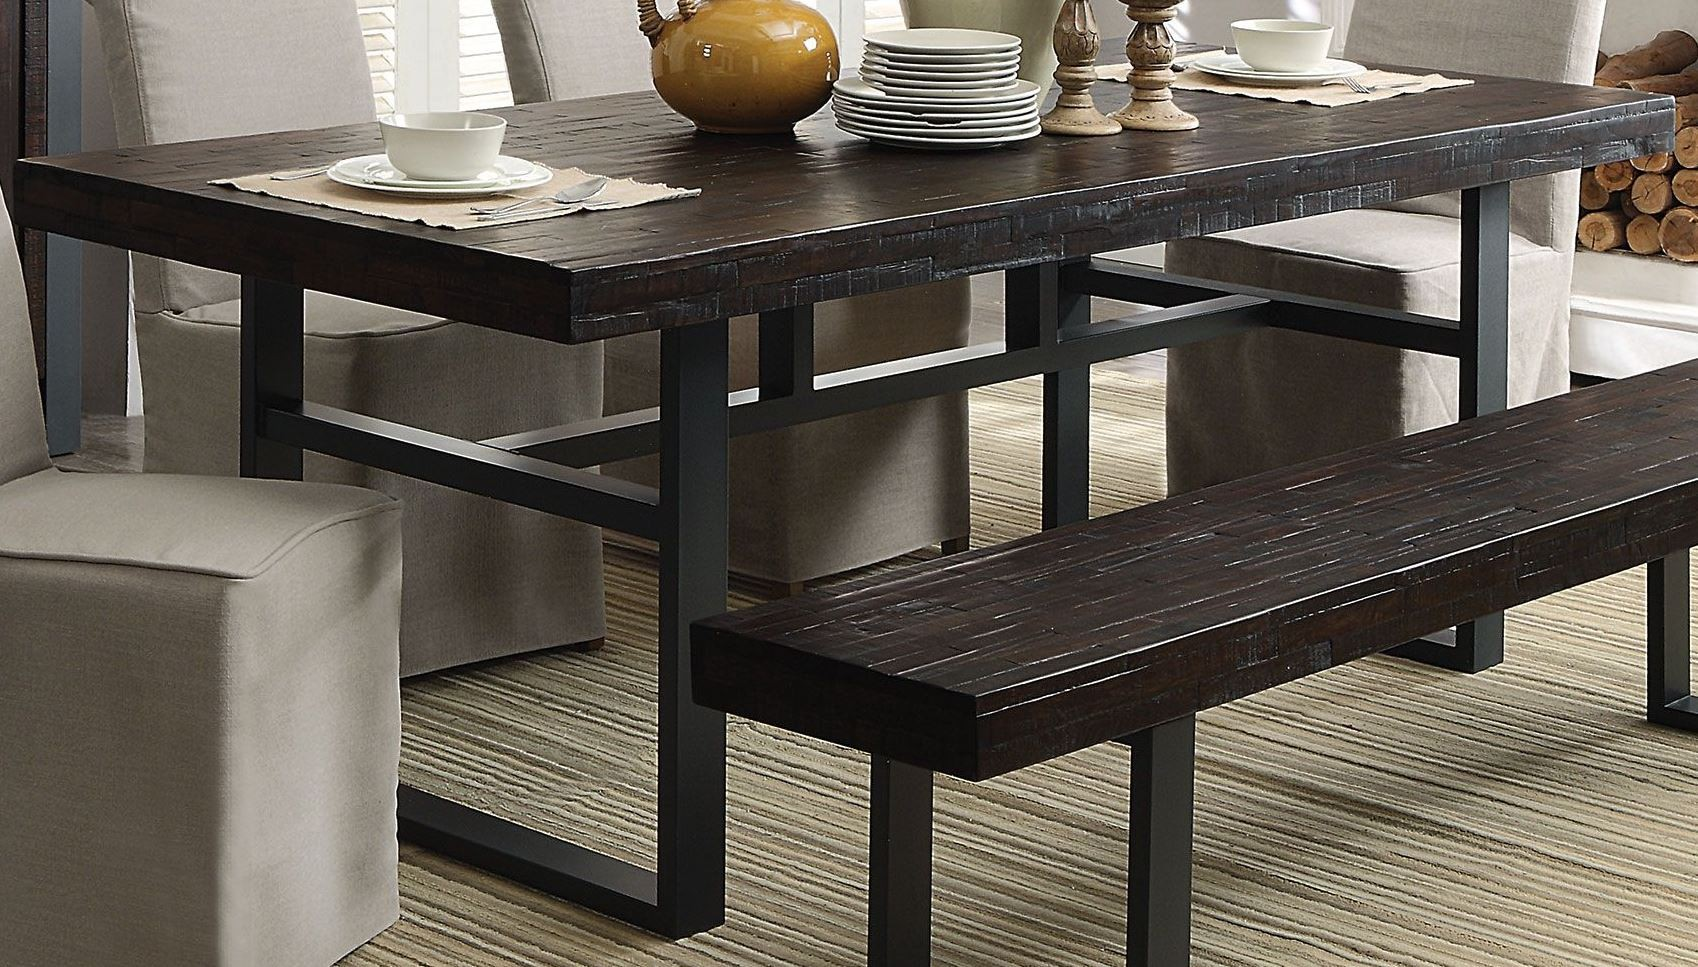 Keller Reclaimed Wood Dining Table, 106941, Coaster Furniture